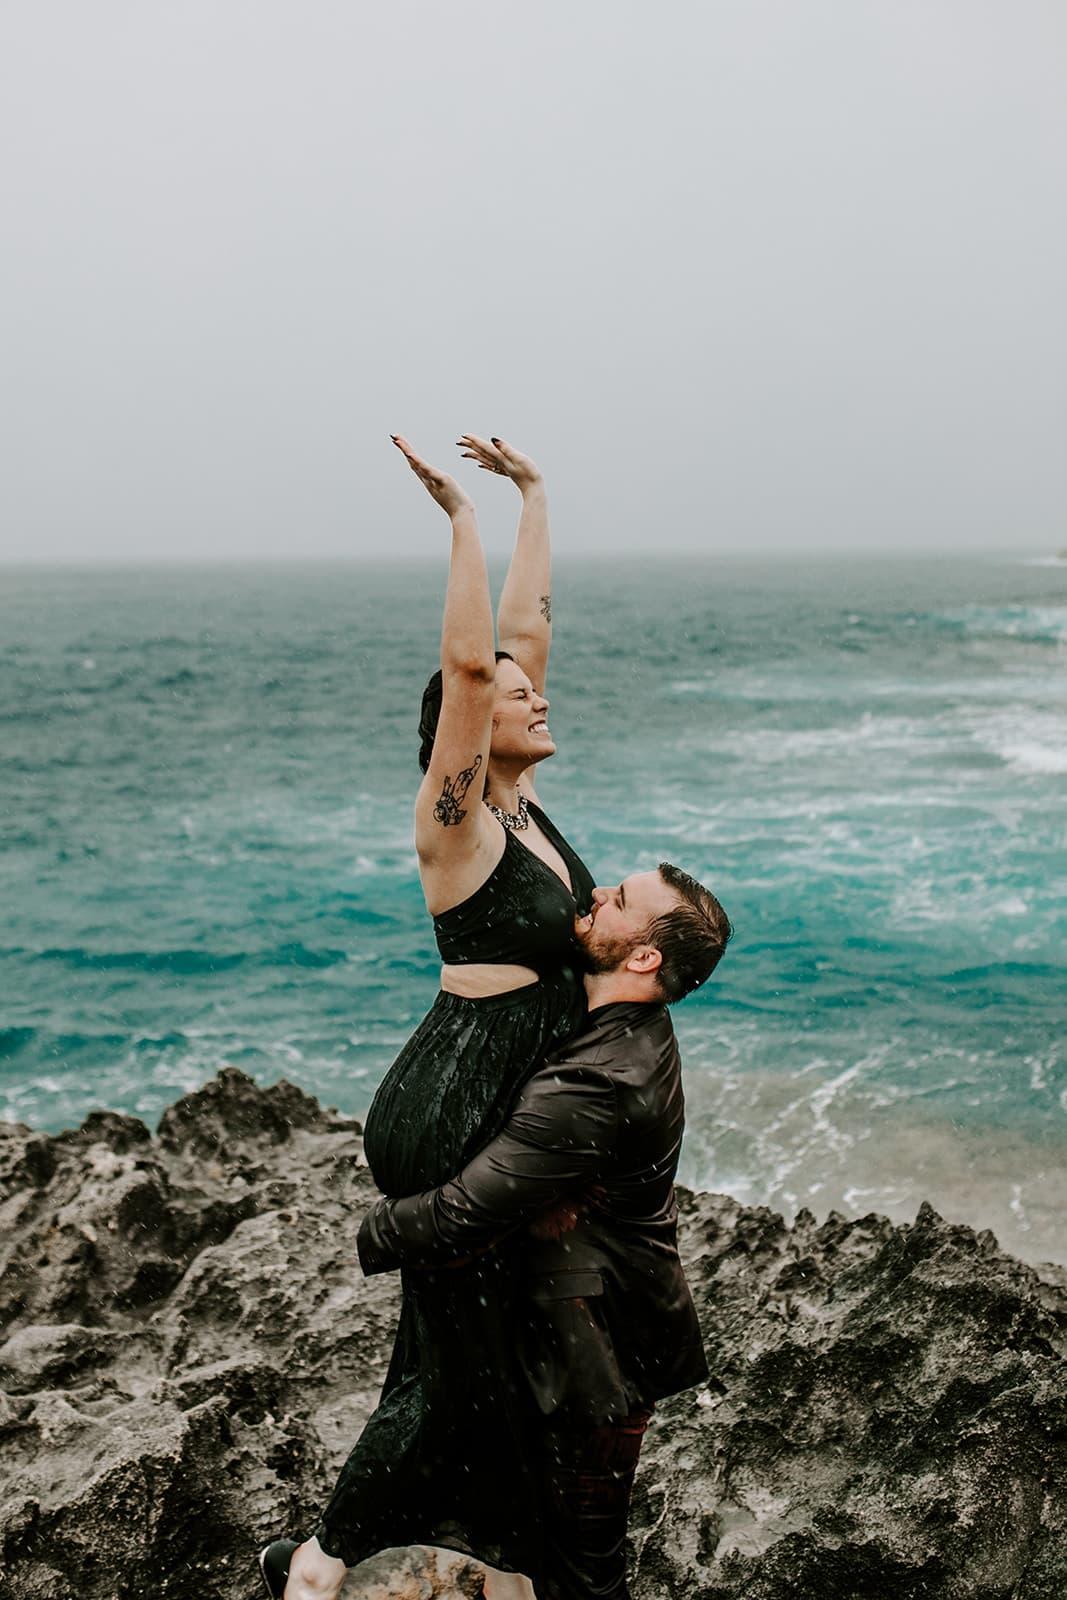 couple dancing on the beach in the rain